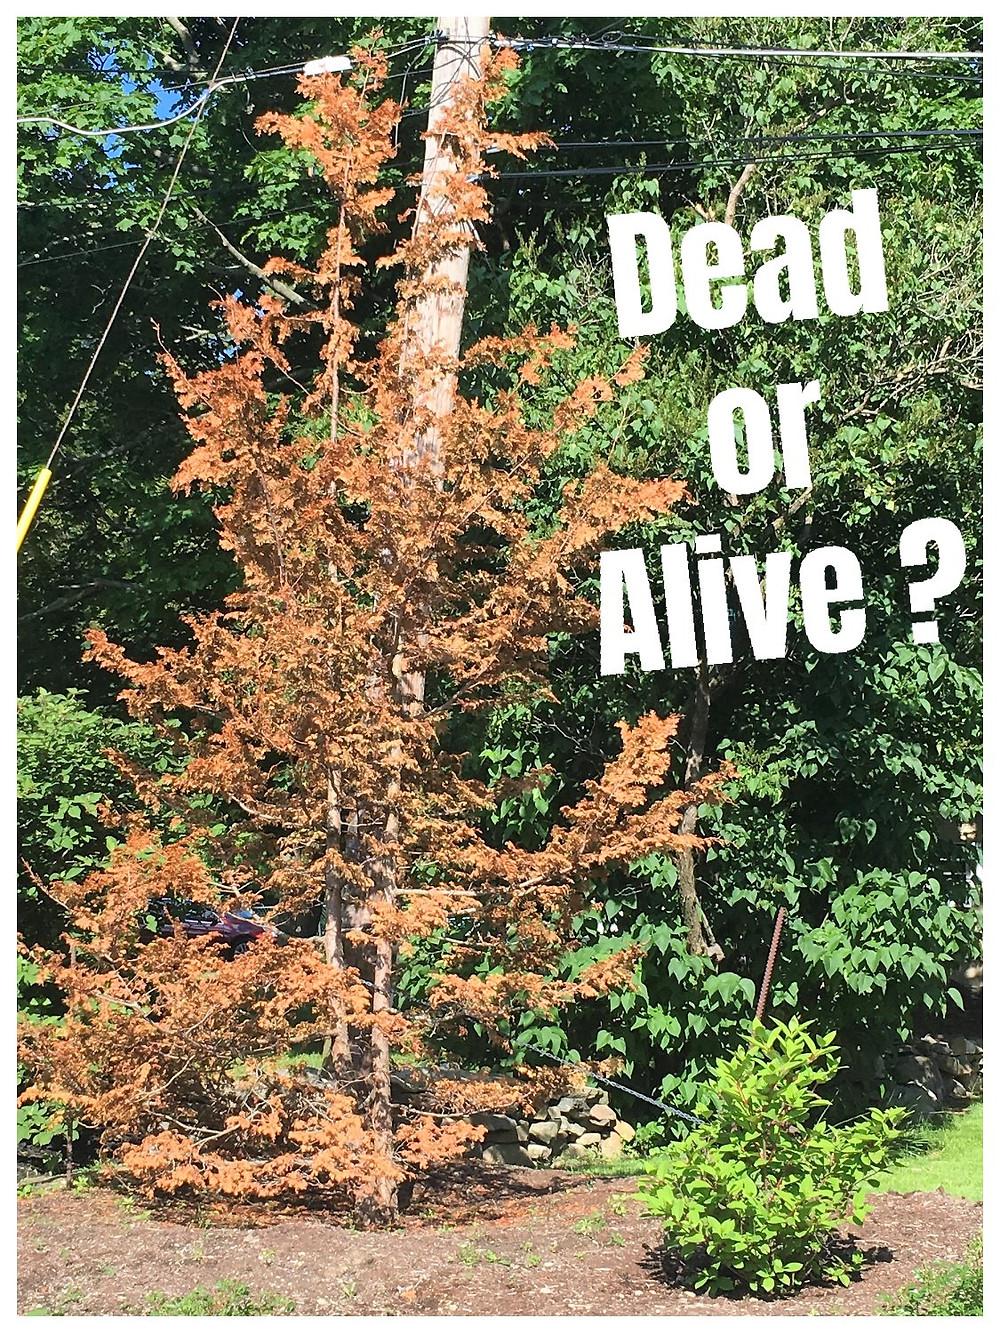 Hinoke Cypress appears to be dead.